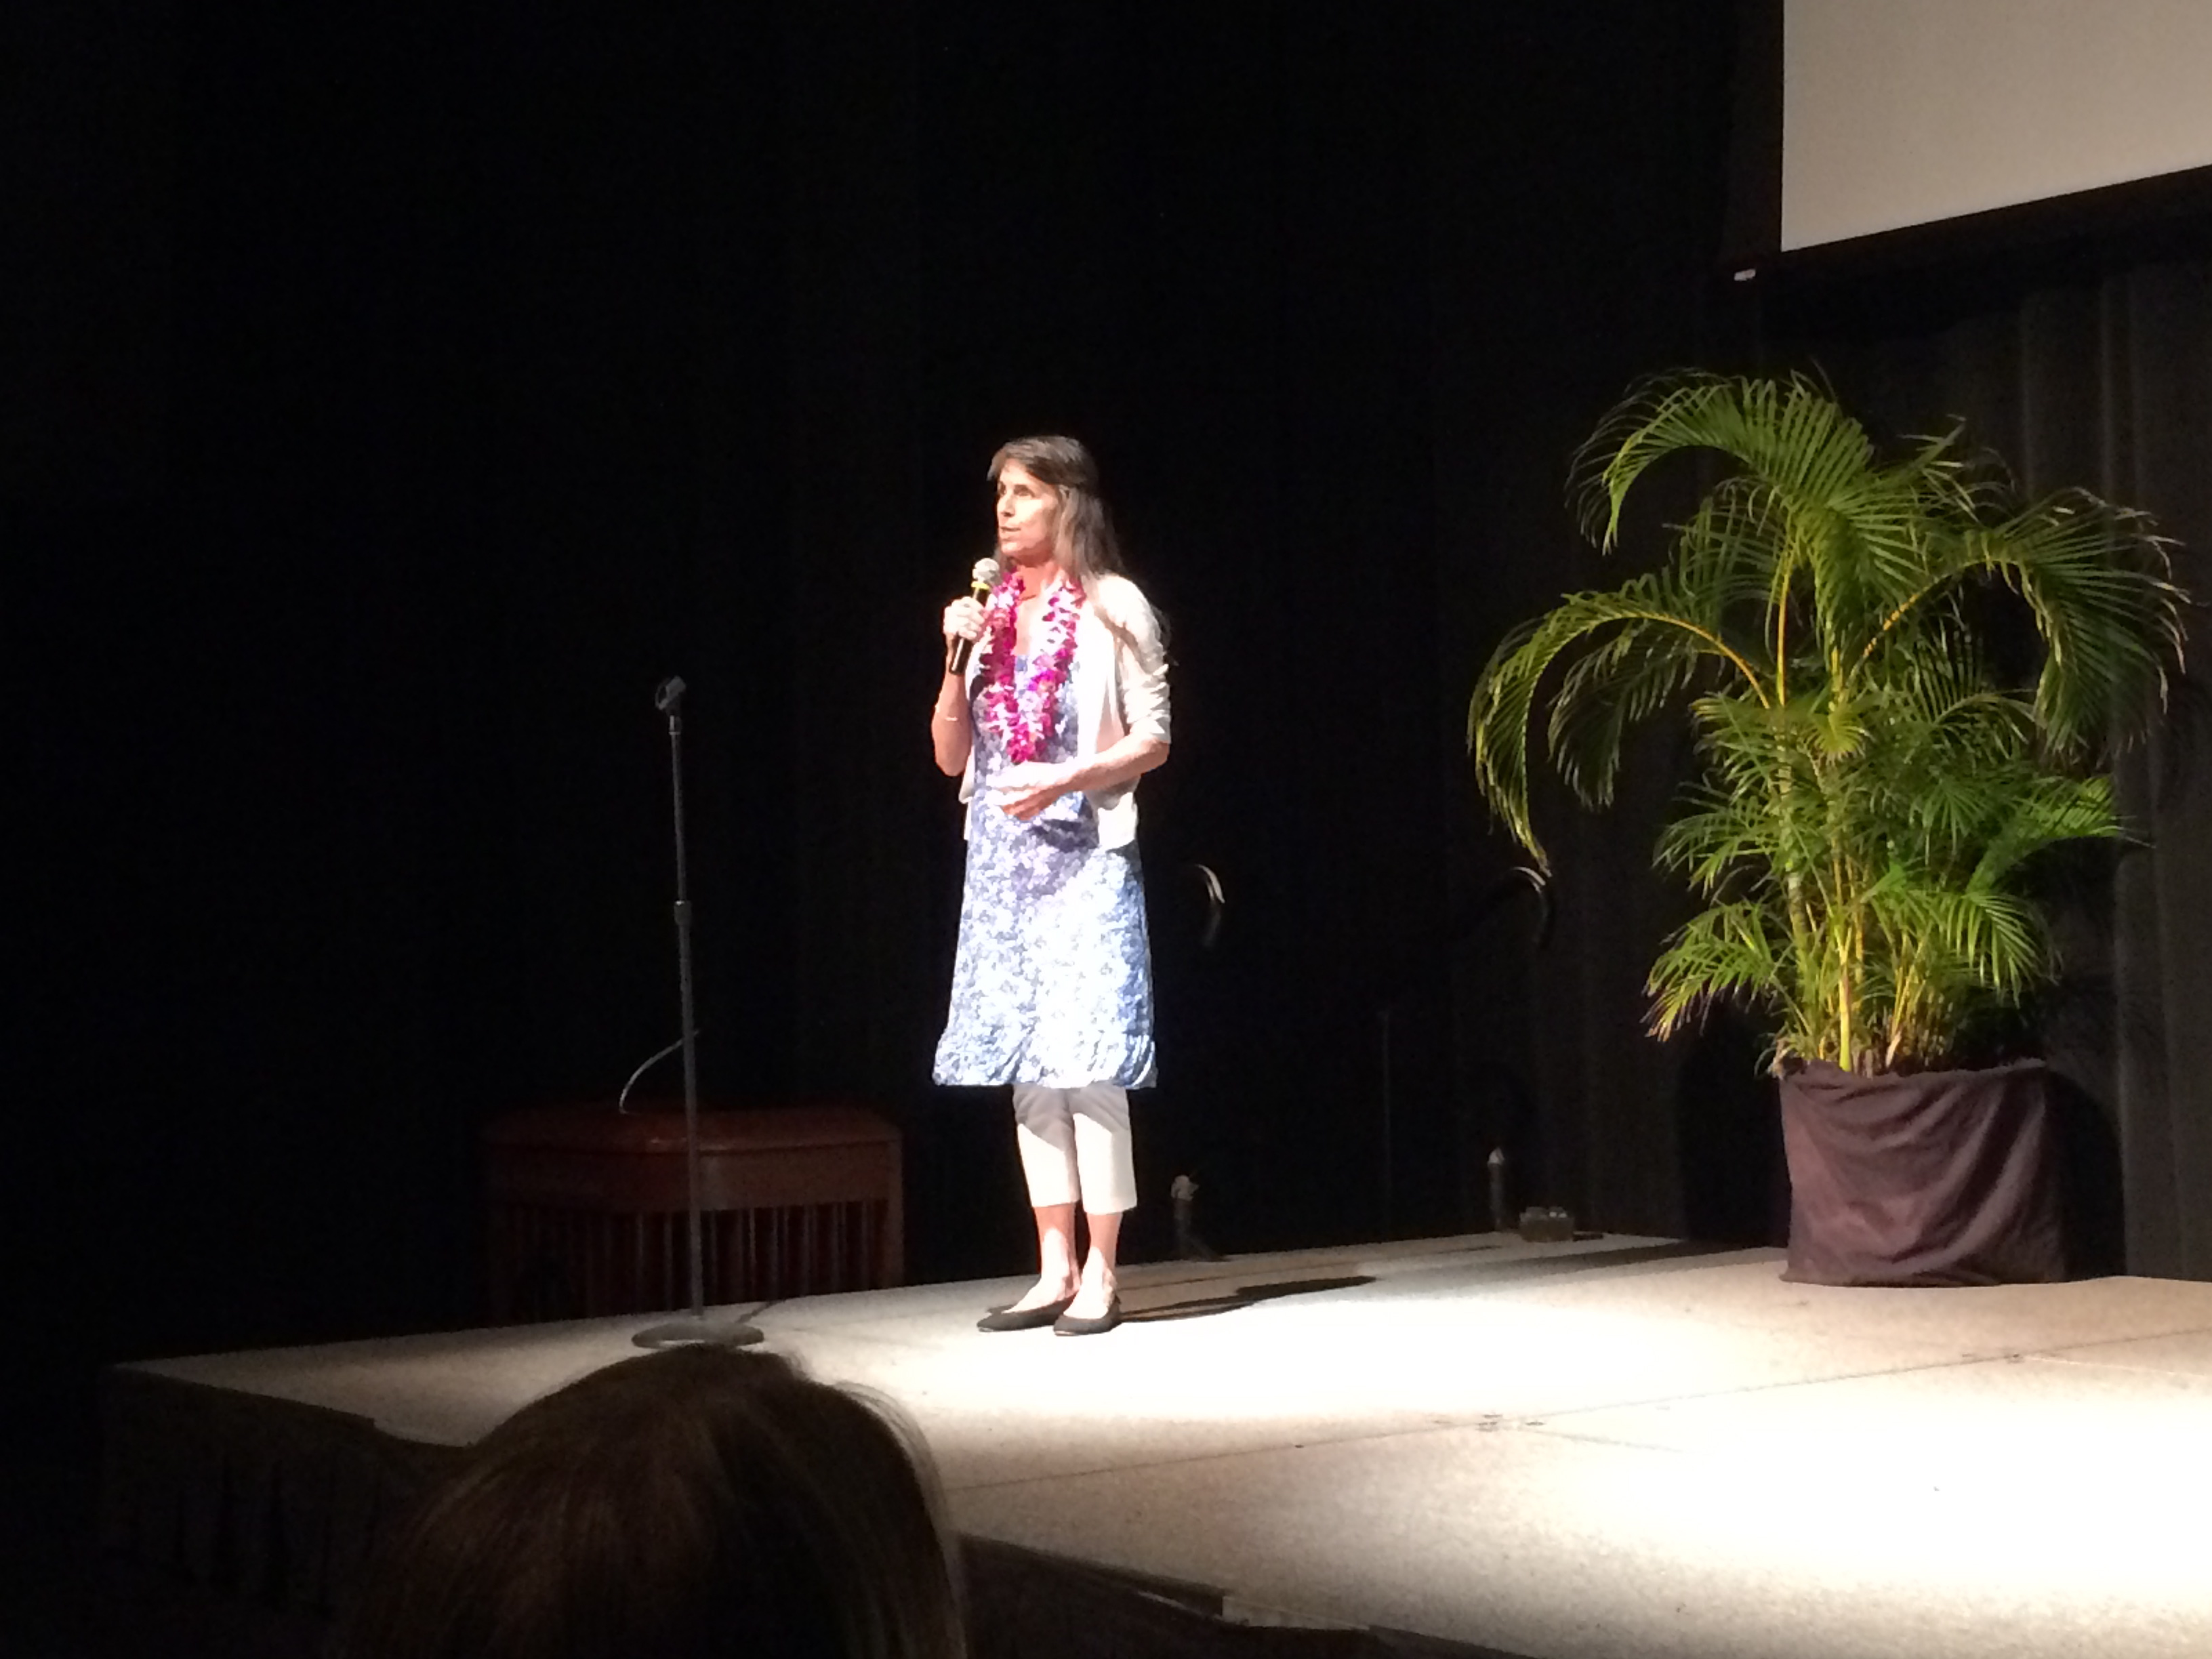 Deborah Koons Garcia introduces Symphony of the Soil in The Green Room